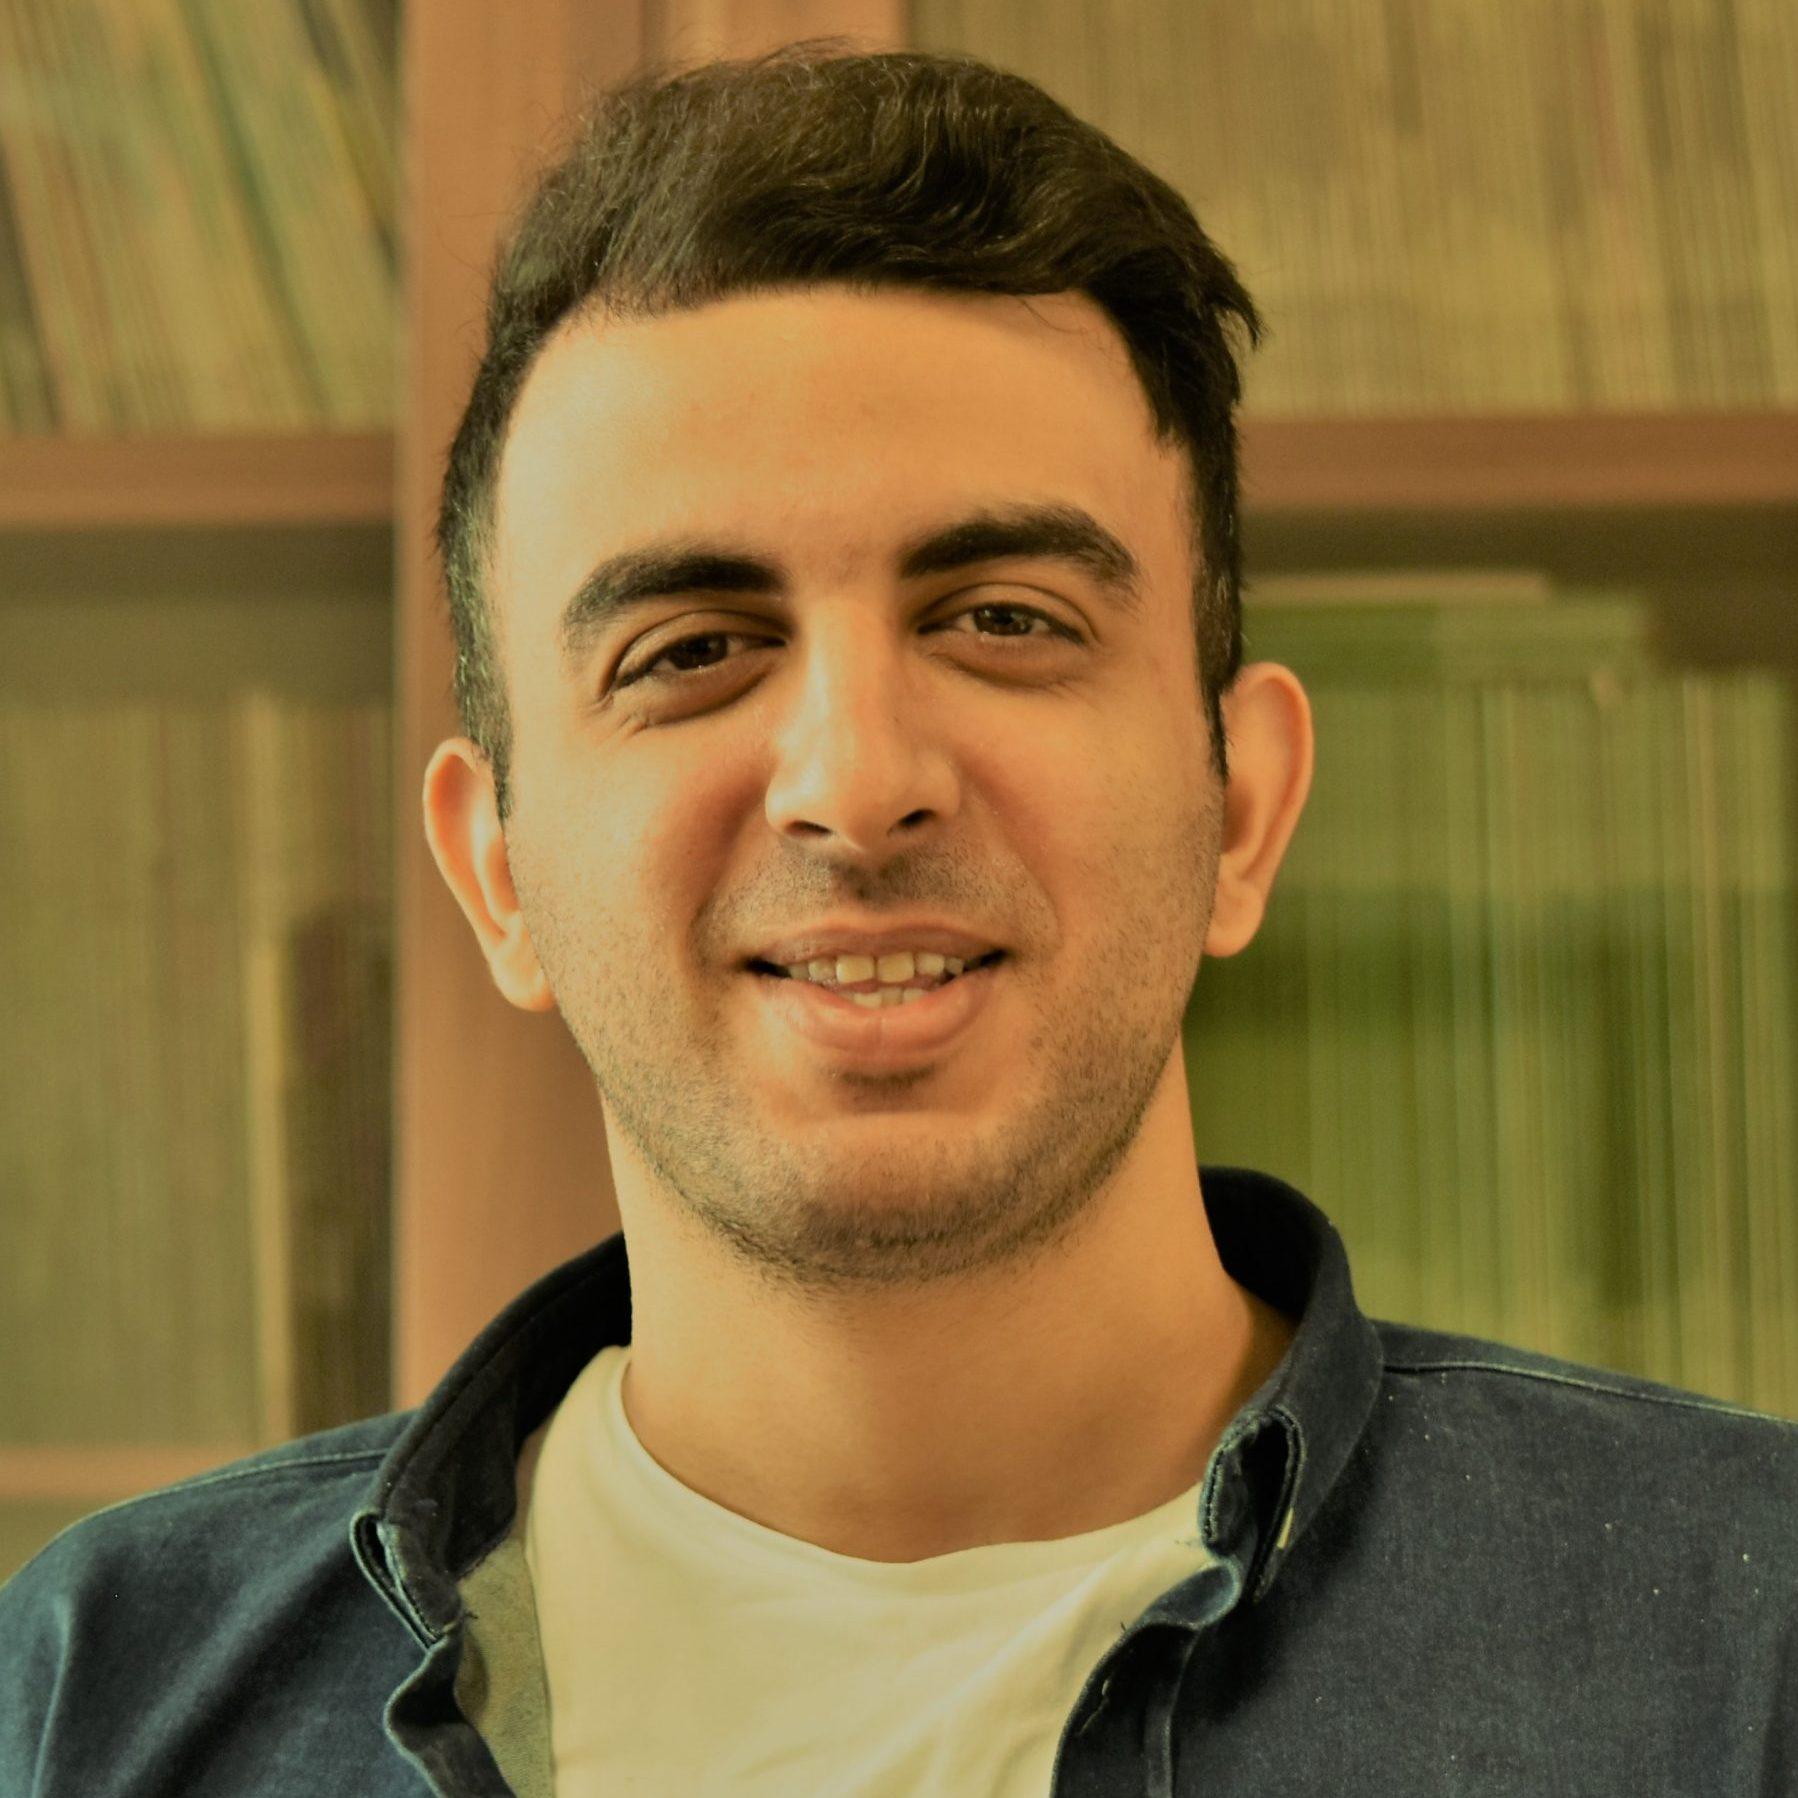 Arash Vafaei